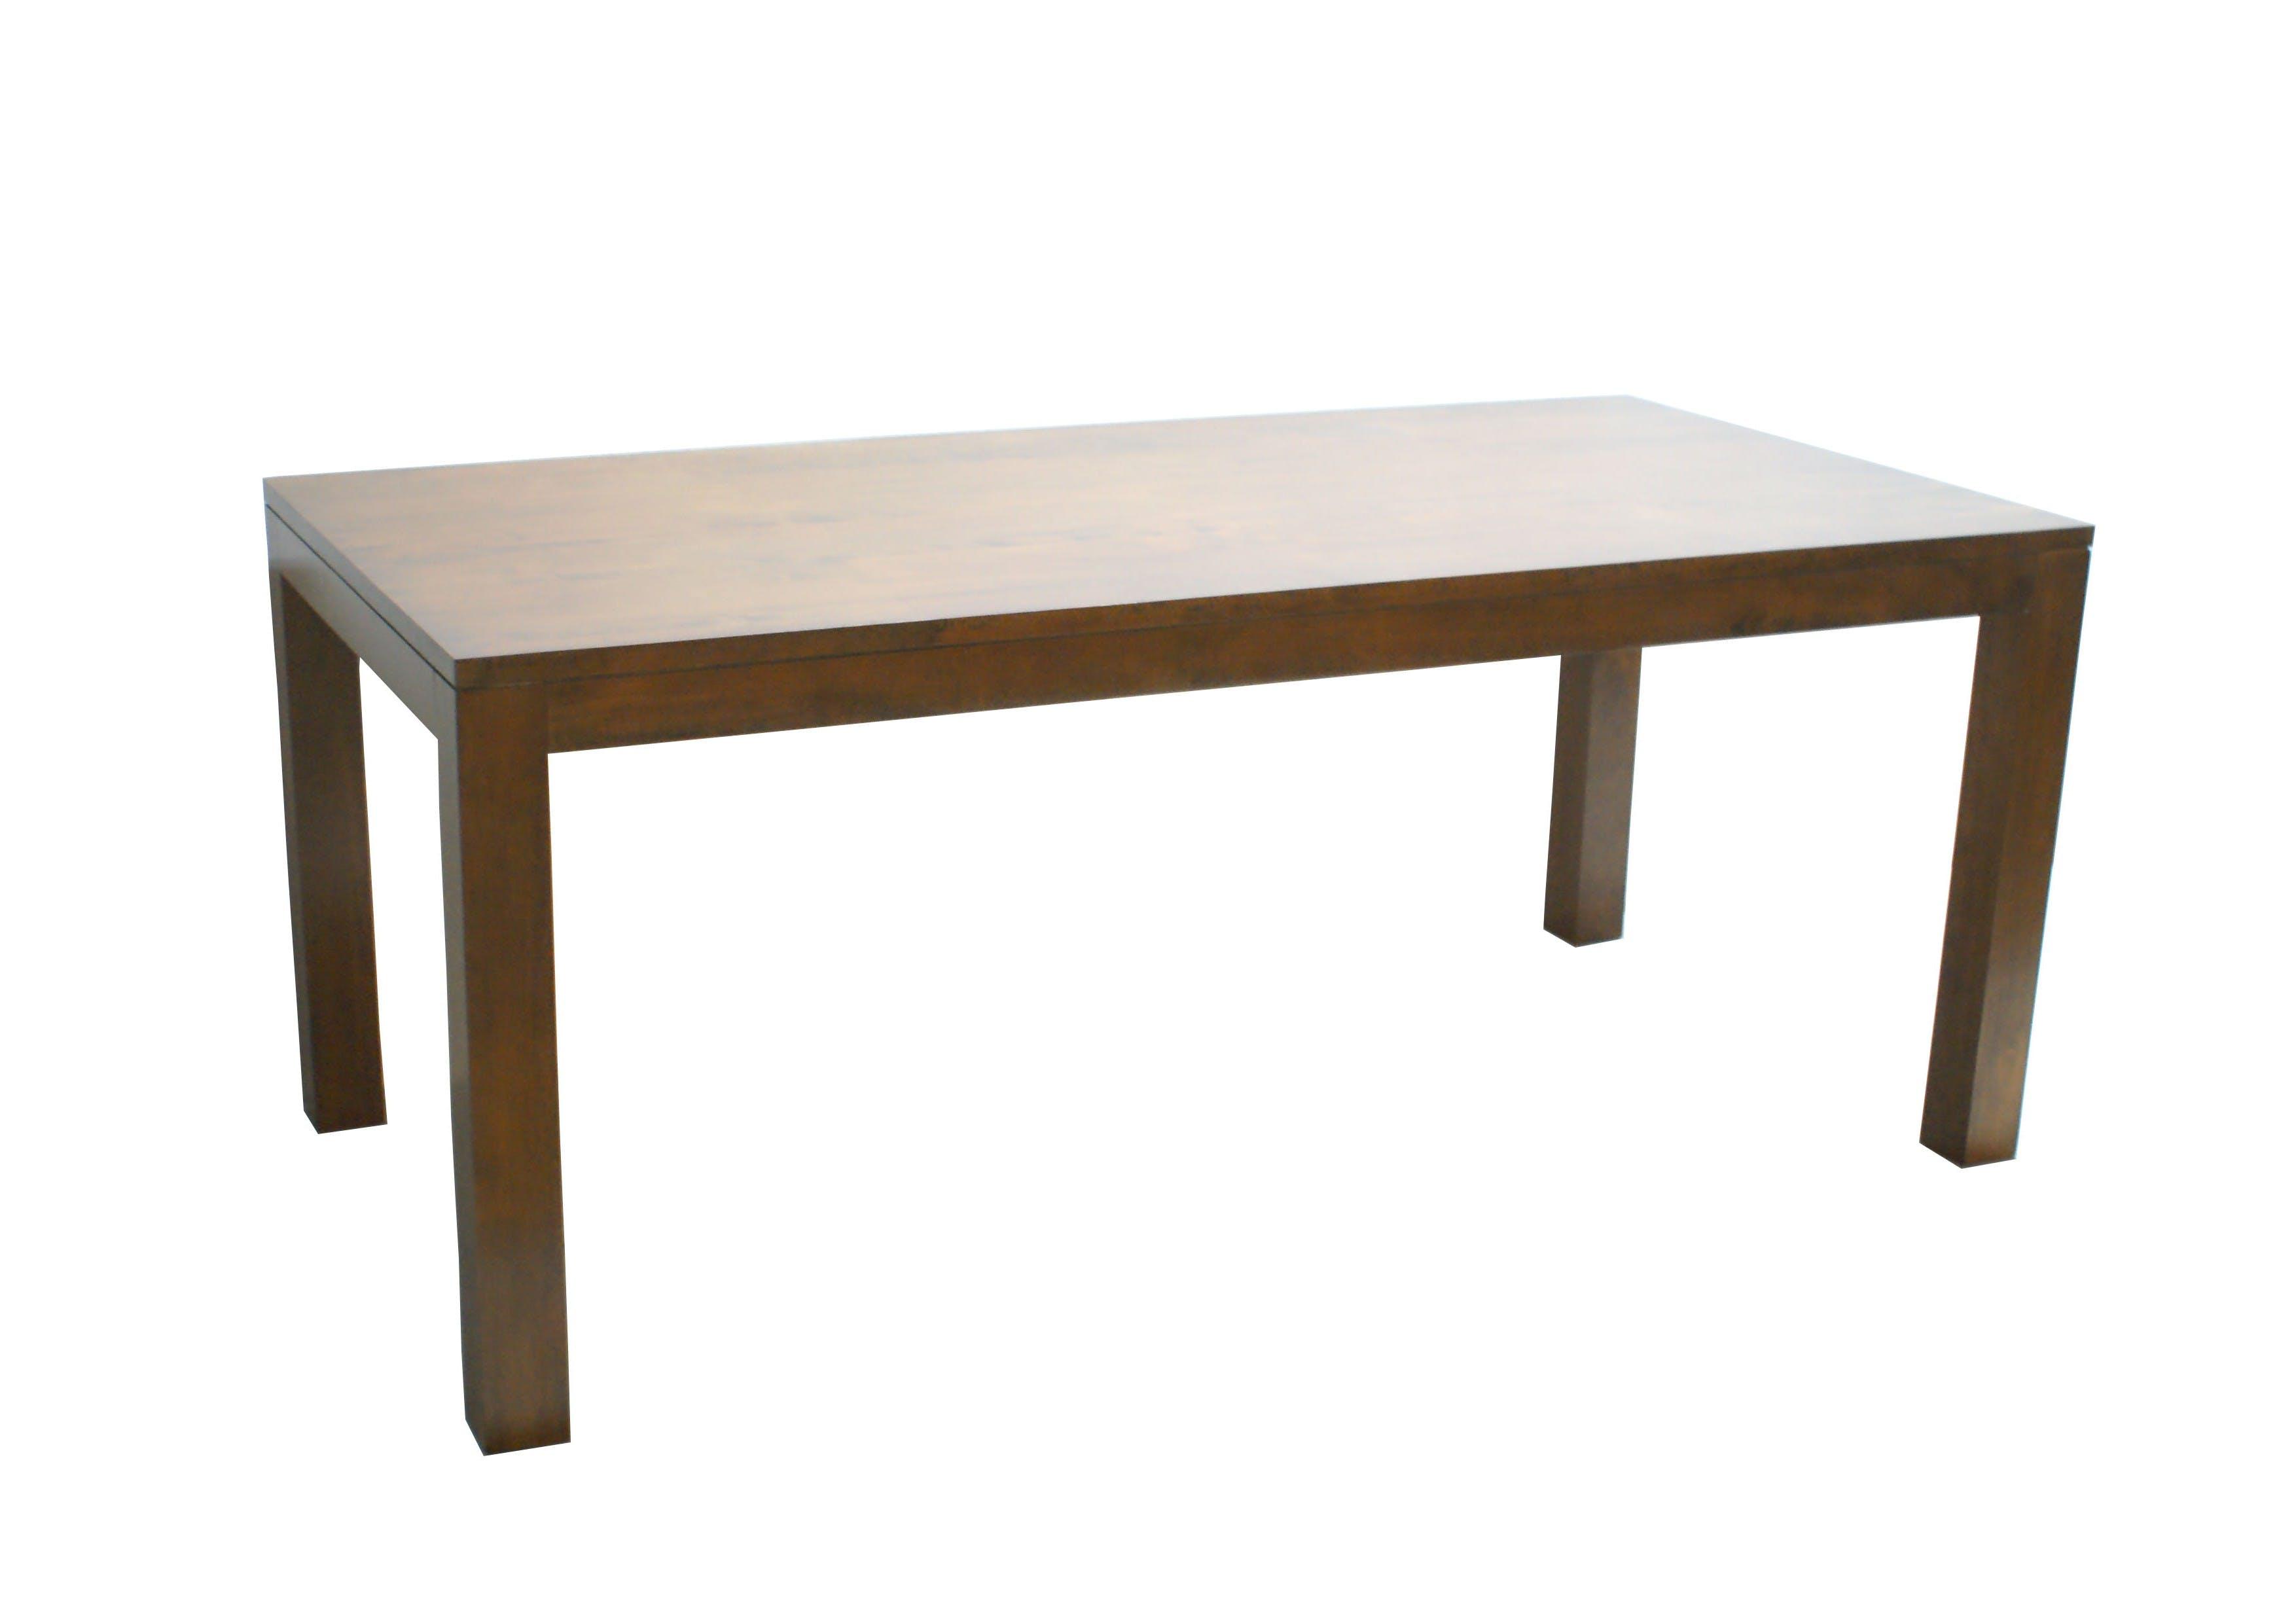 Table de repas Hévéa 180x90X75cm OLGA